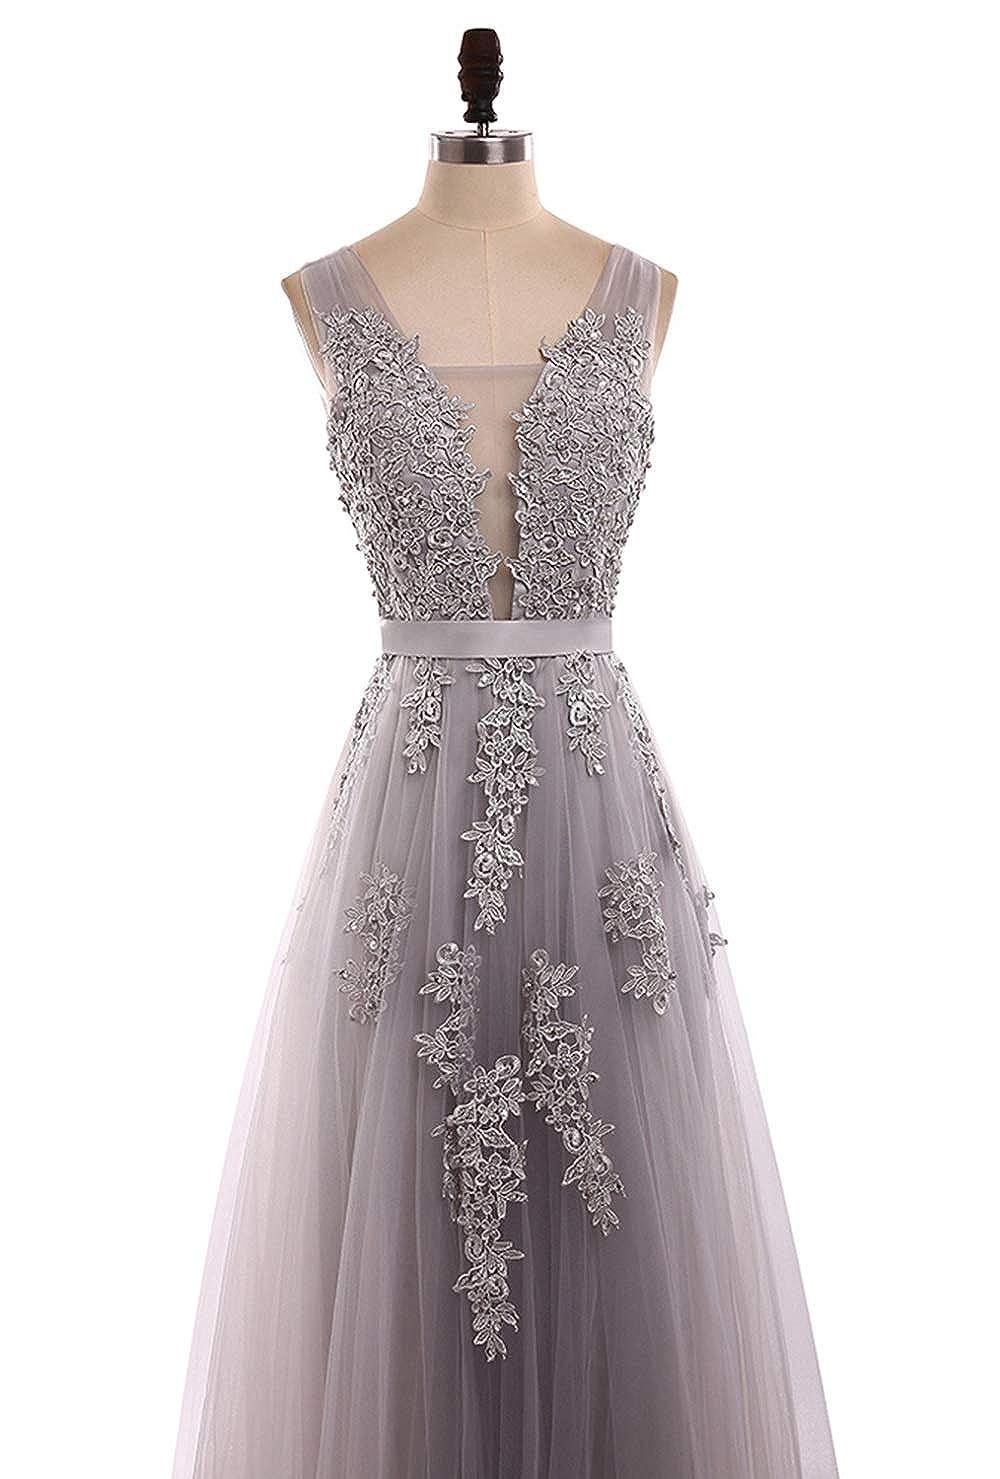 c6f648ce84e Amazon.com  V Neck Prom Dresses Beading Chiffo Party Evening Elegant Sexy  High Split MNQ170406  Clothing